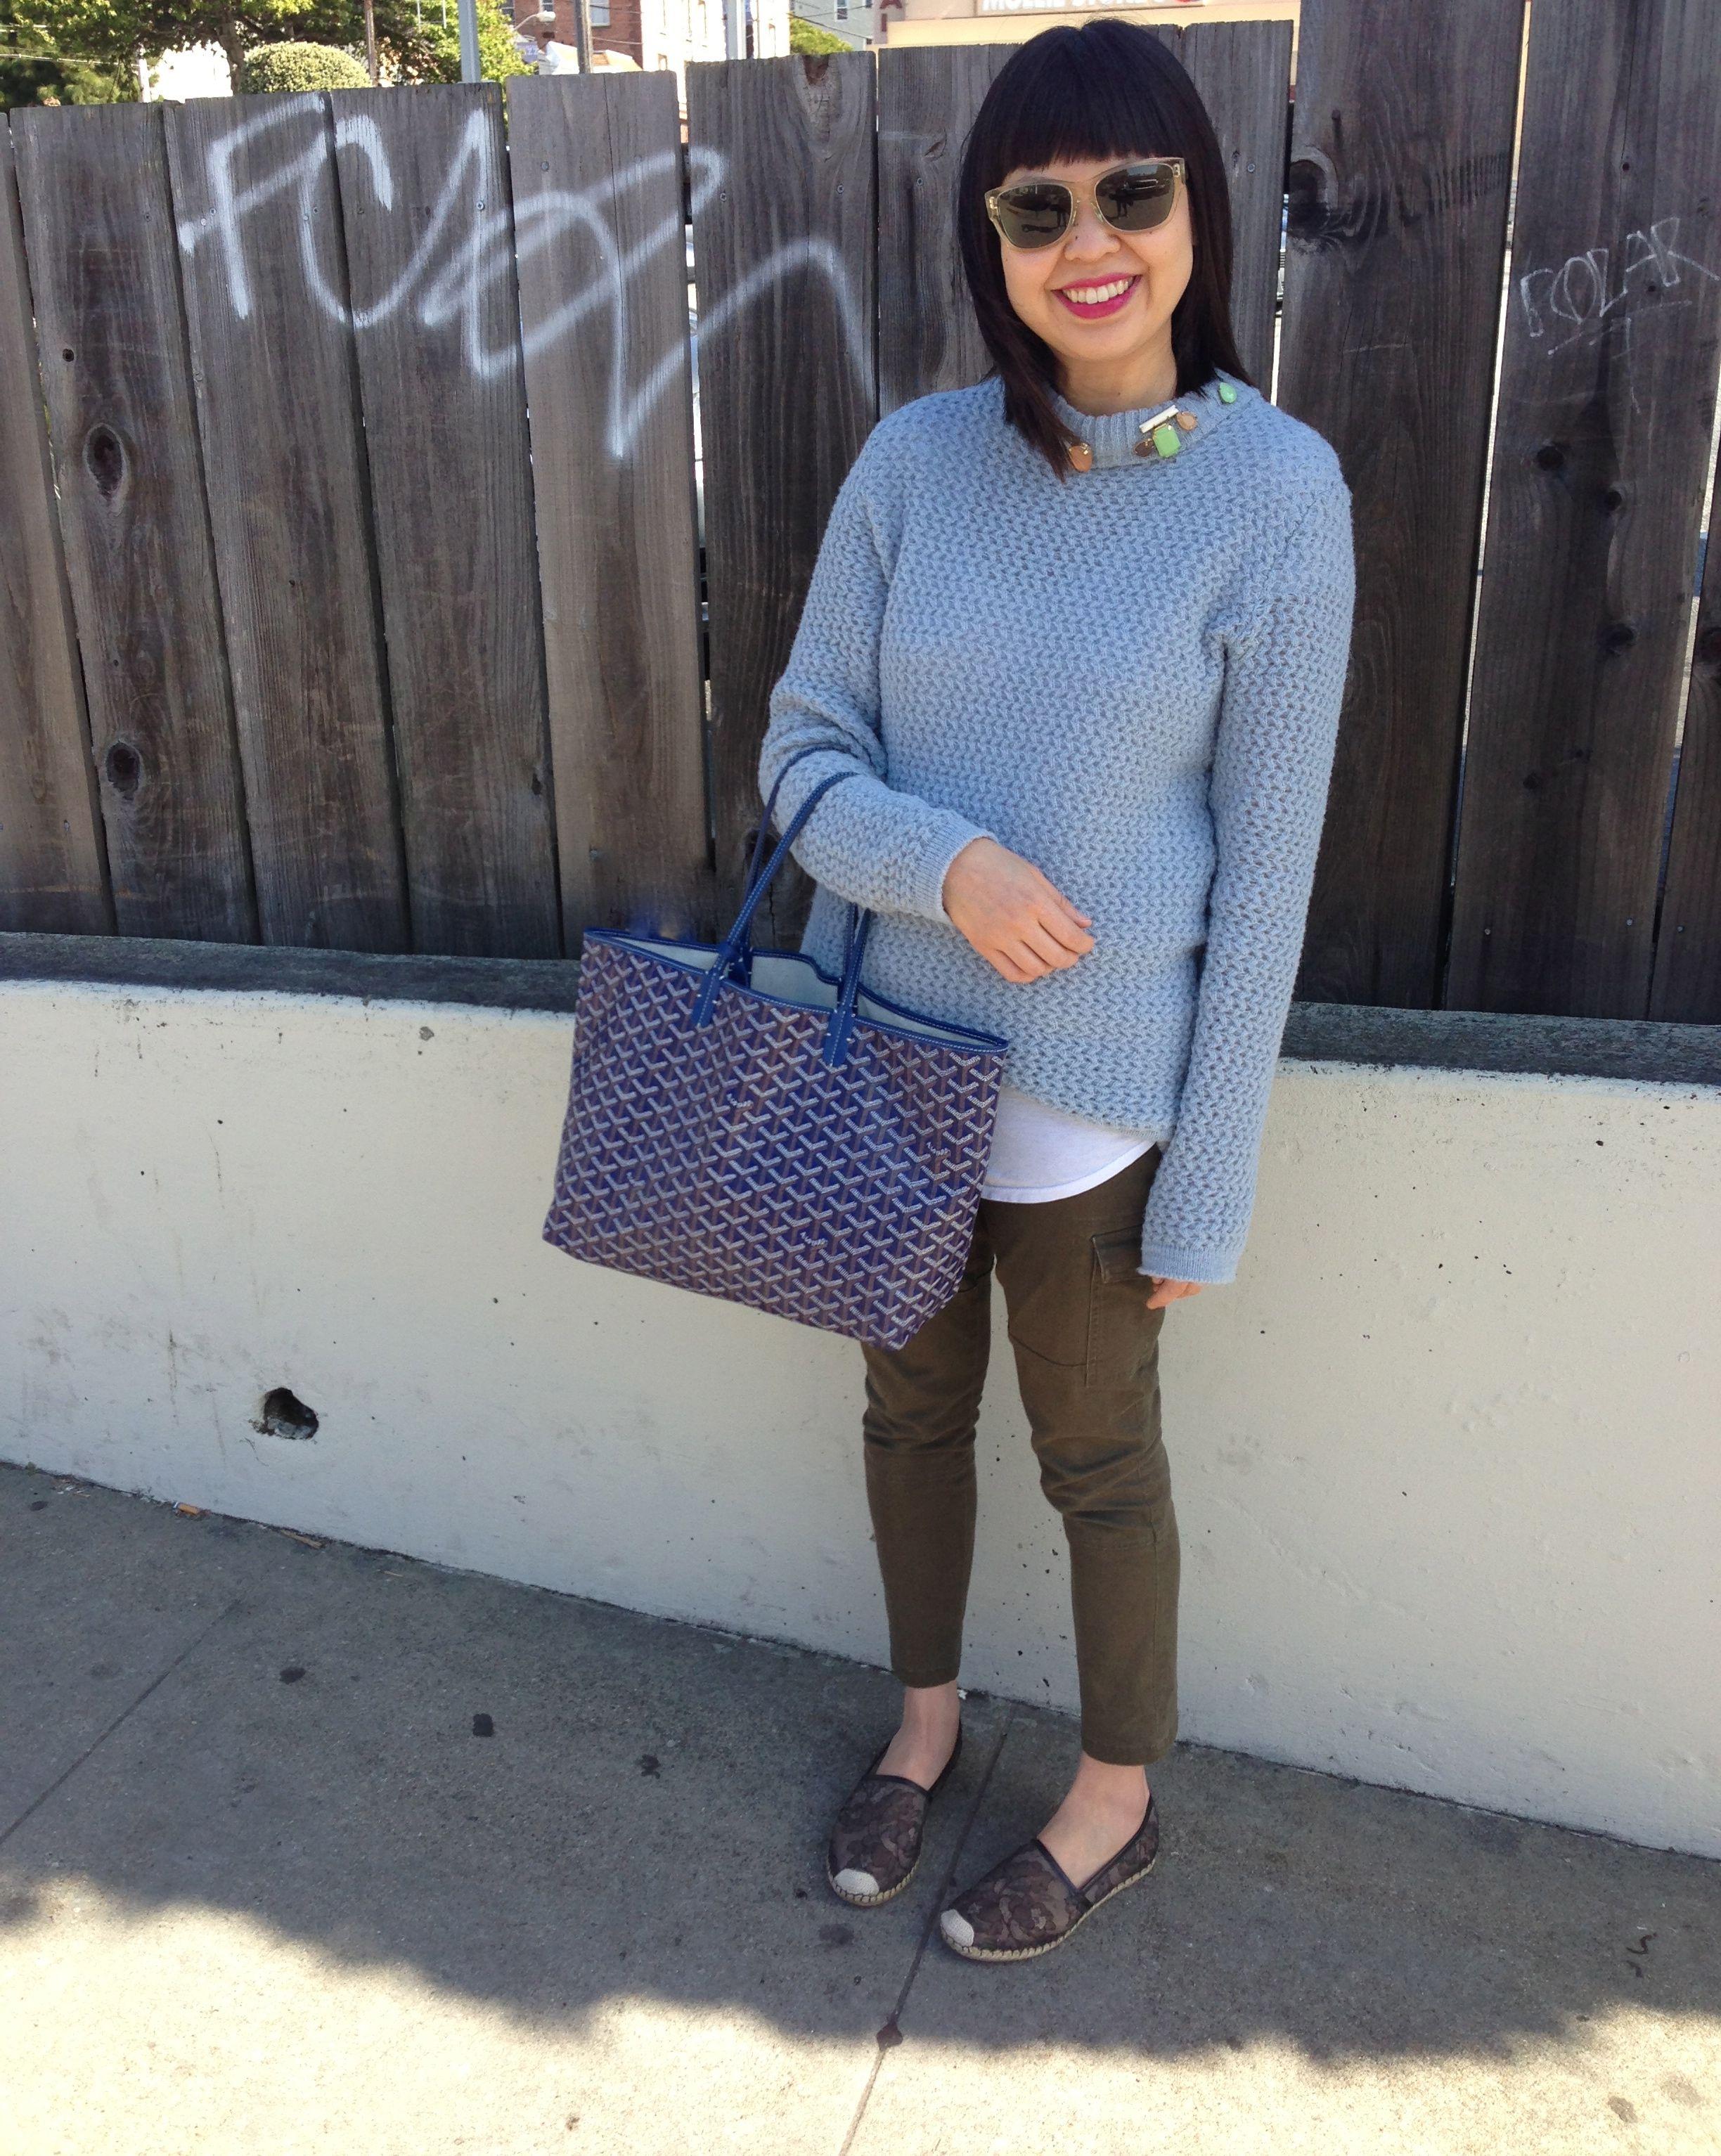 45e001d5 lolo by lako custom sweater and goyard tote bag | Fashionable ...